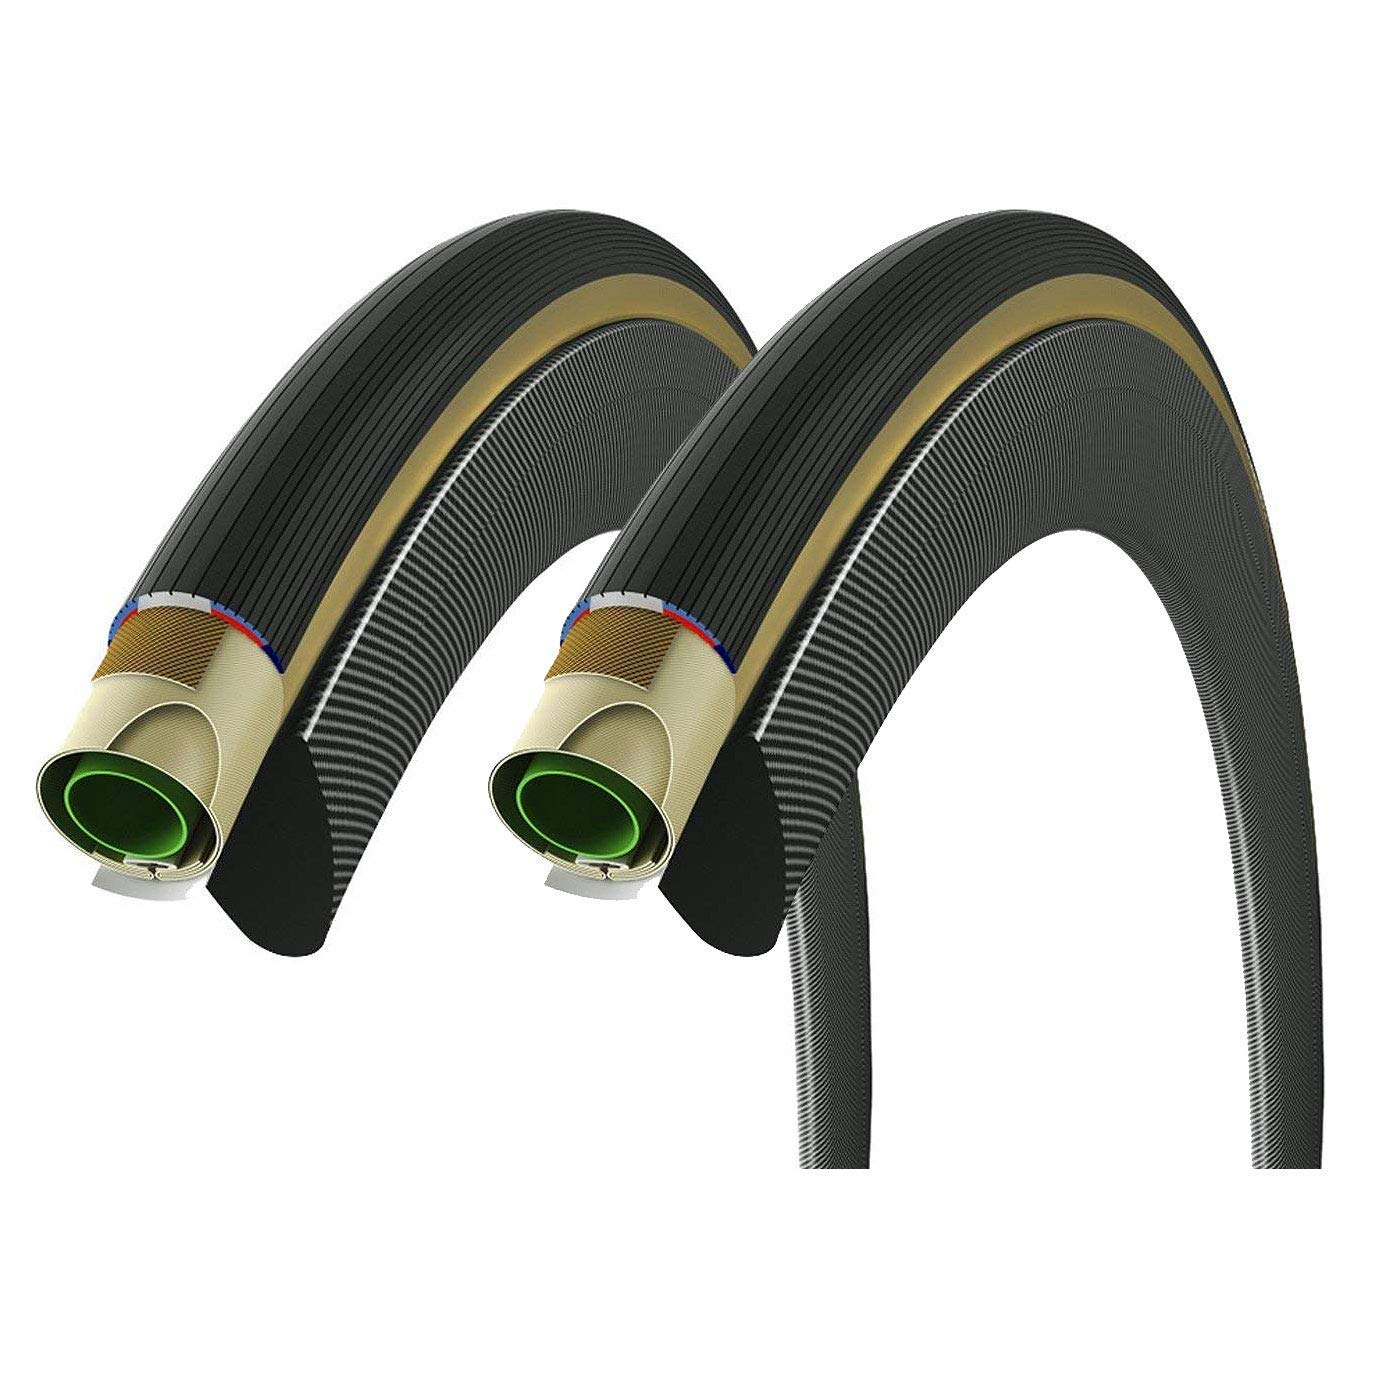 Black//Tan 700 x 23mm Vittoria Pista Open Graphene 2.0 Folding Clincher Tyre